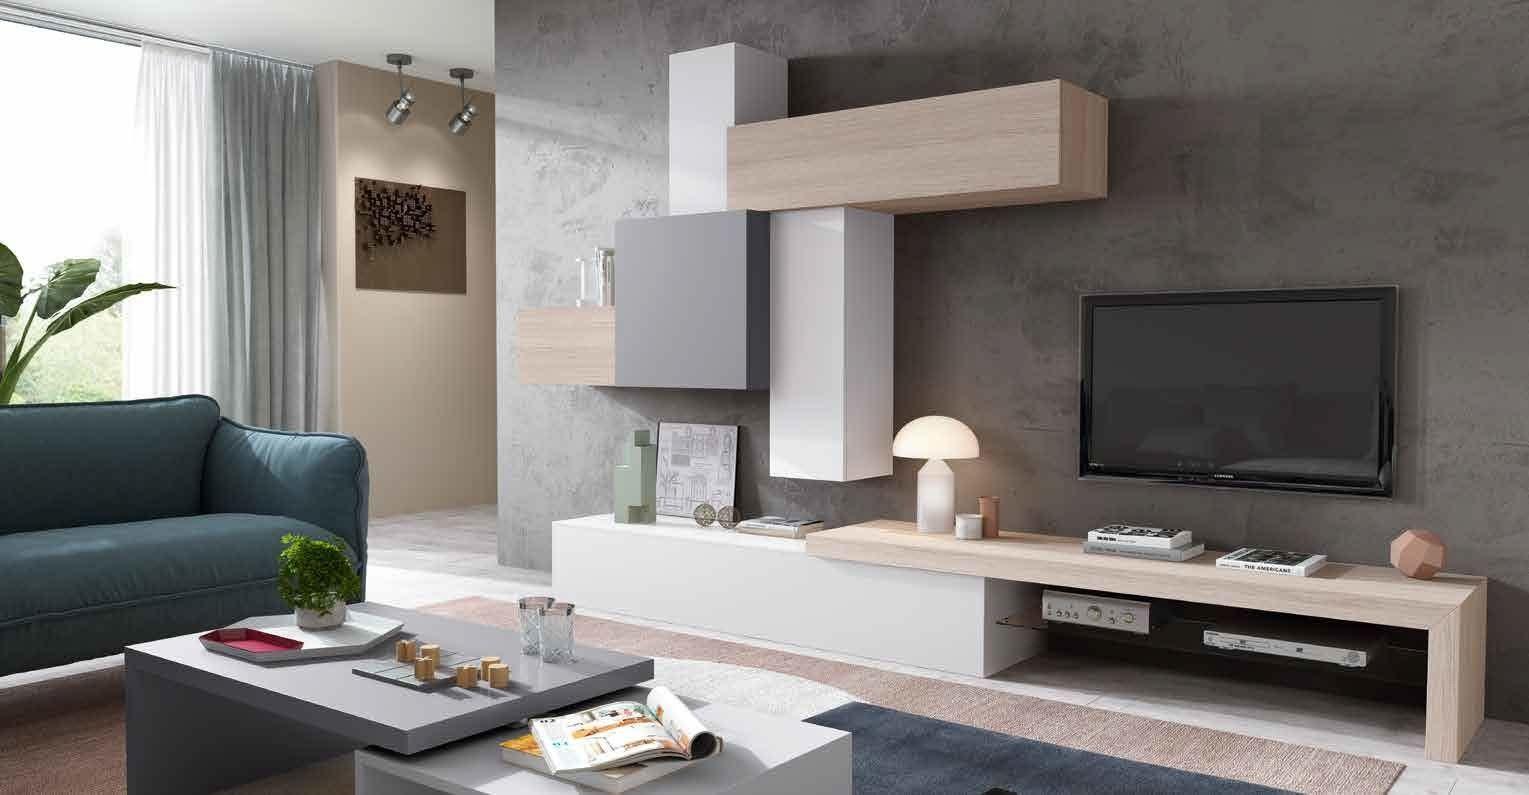 "Cuisine Plus Tv Impressionnant Image Sal³n Moderno Loop 1 Pacheco S Selecti""n"